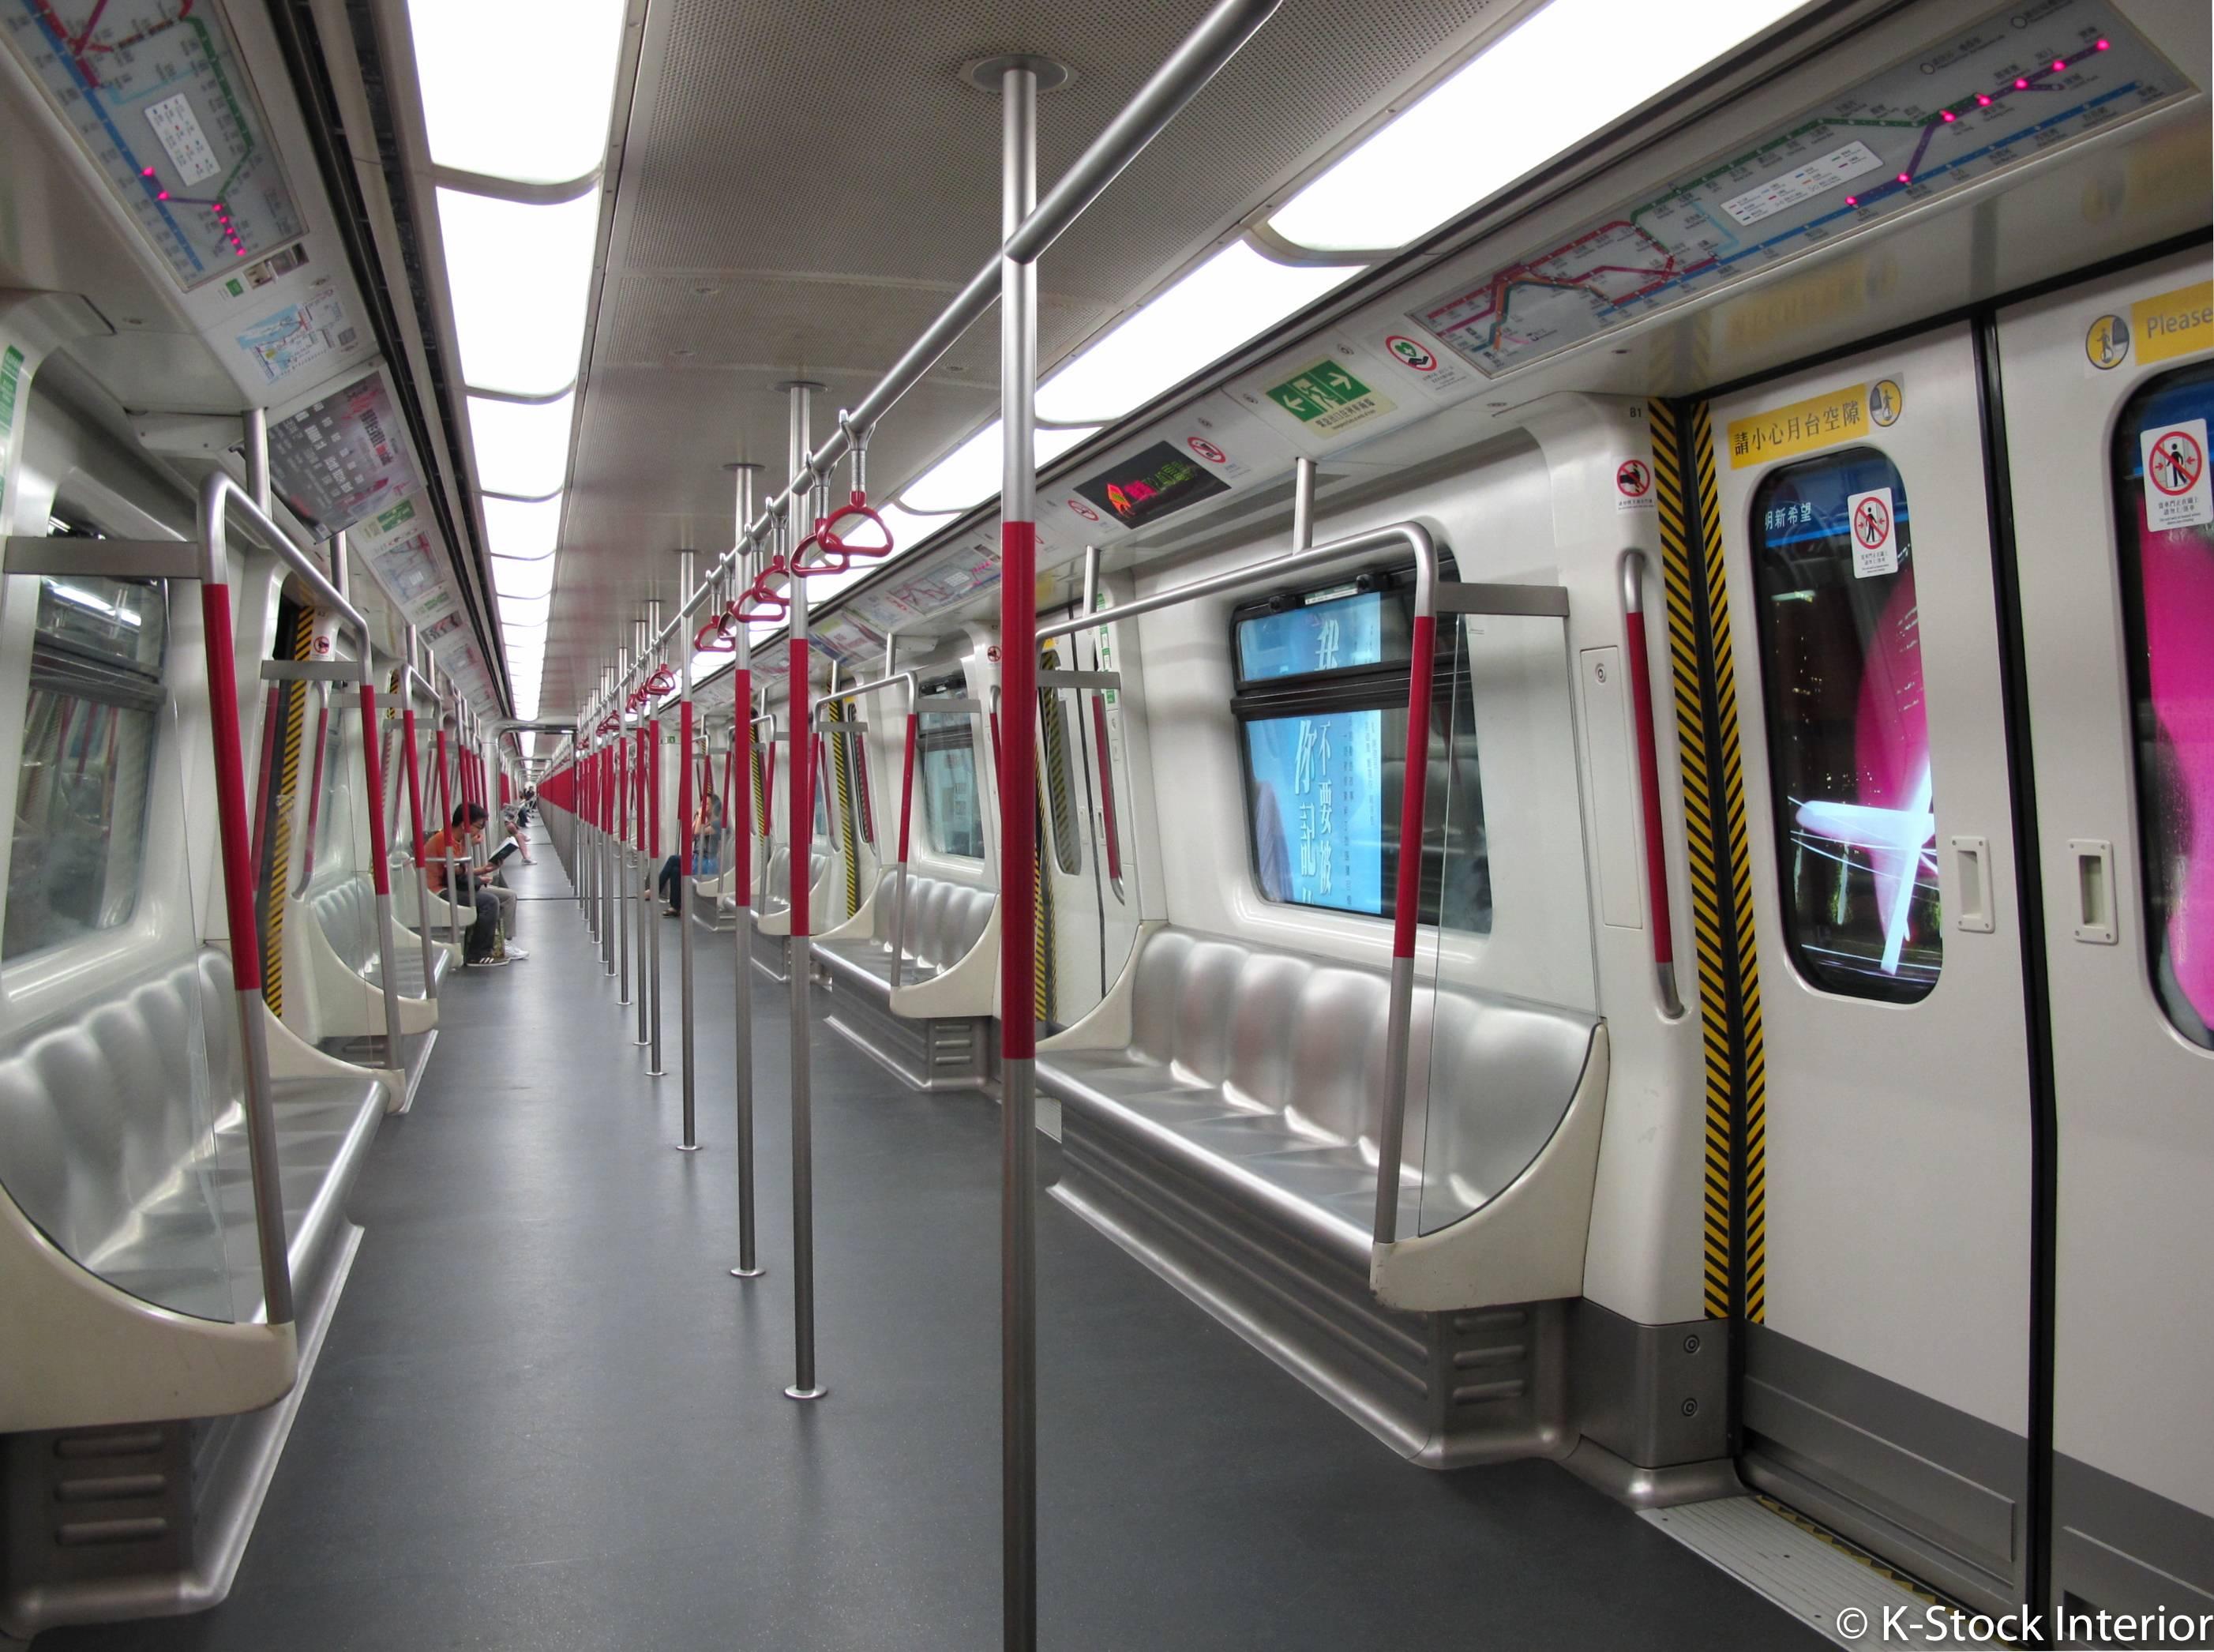 K-Stock_Interior_2010